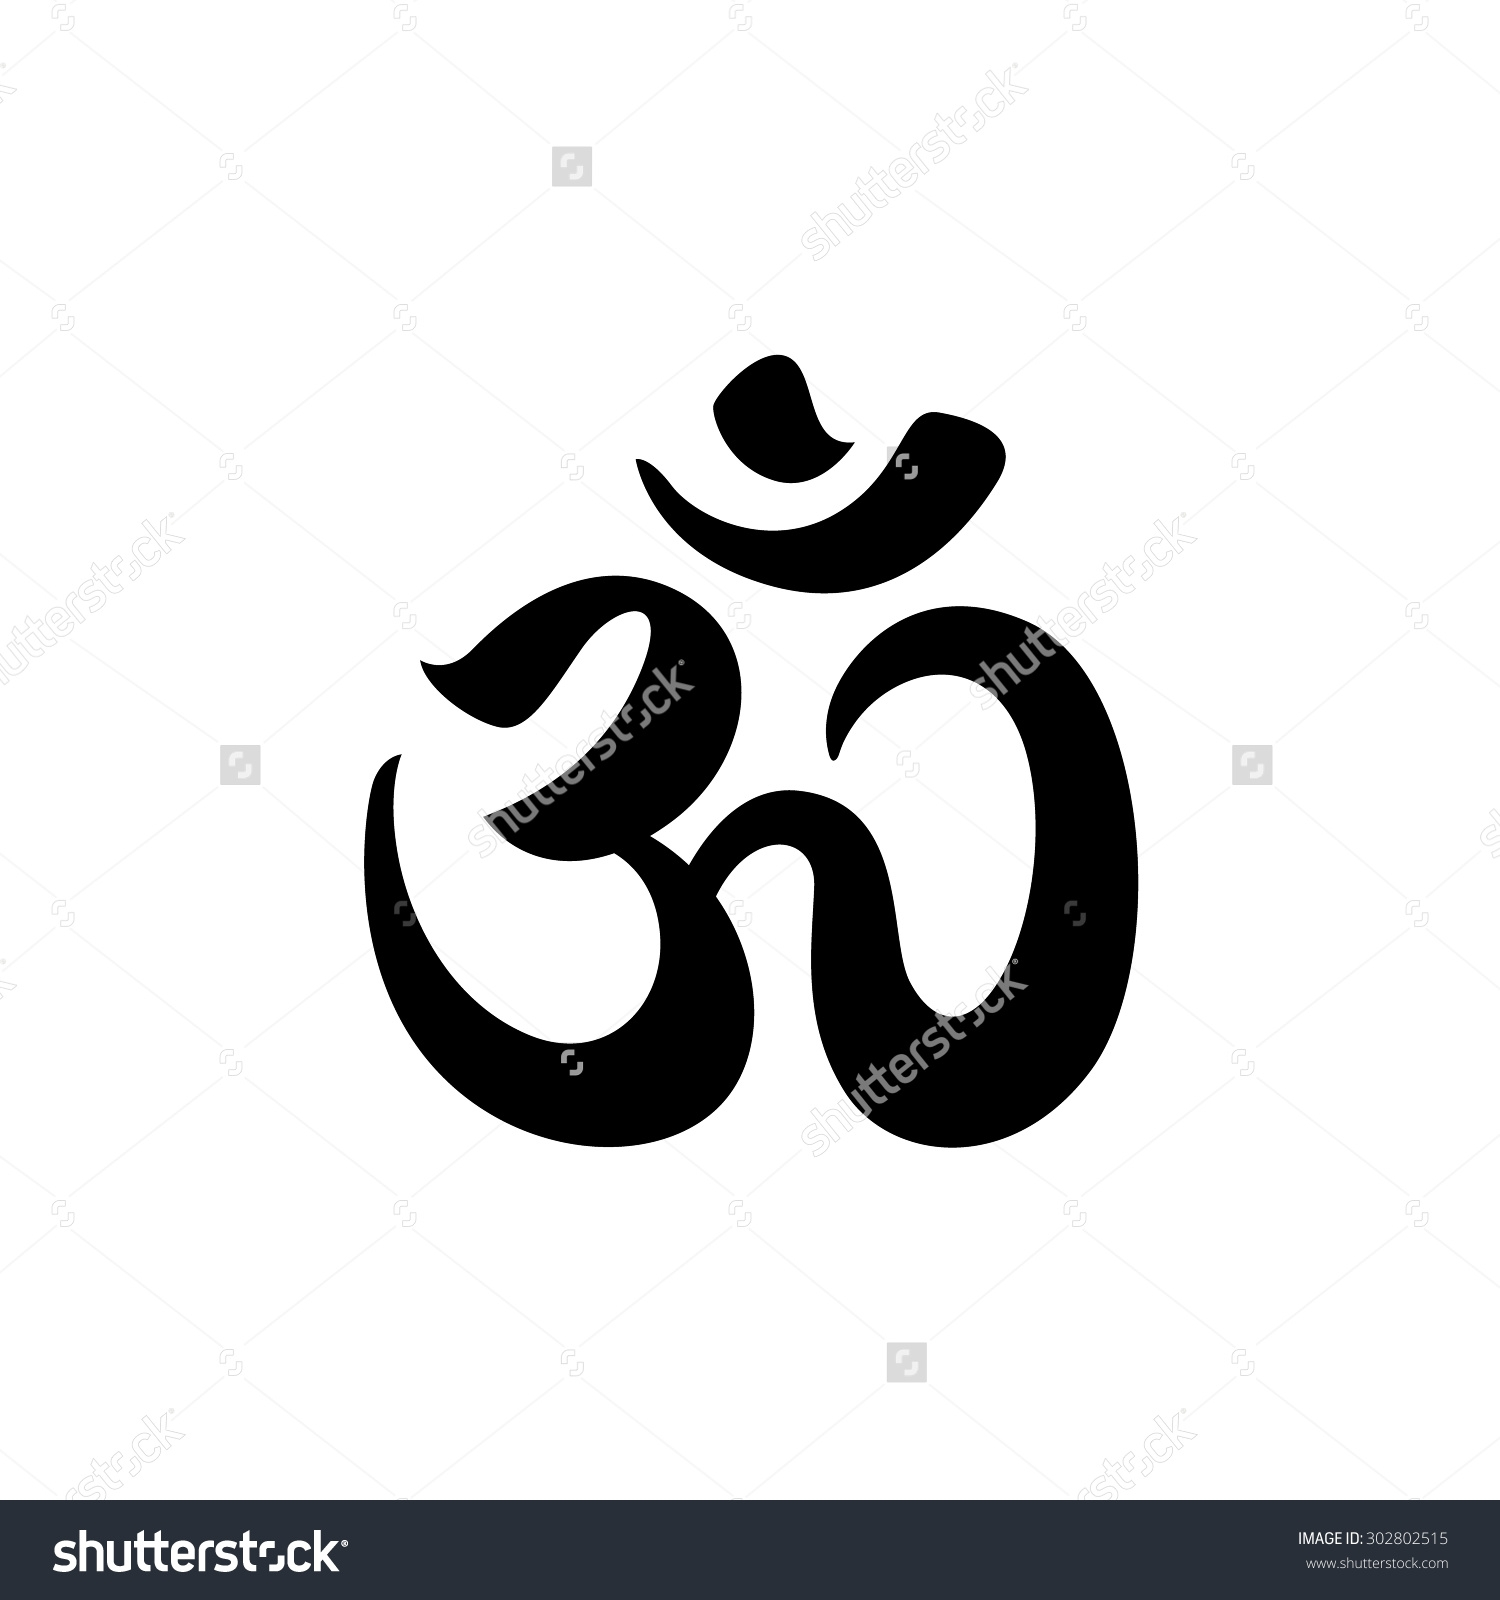 Ganesh clipart free download best ganesh clipart on clipartmag 1500x1600 ganesh om clip art cliparts buycottarizona